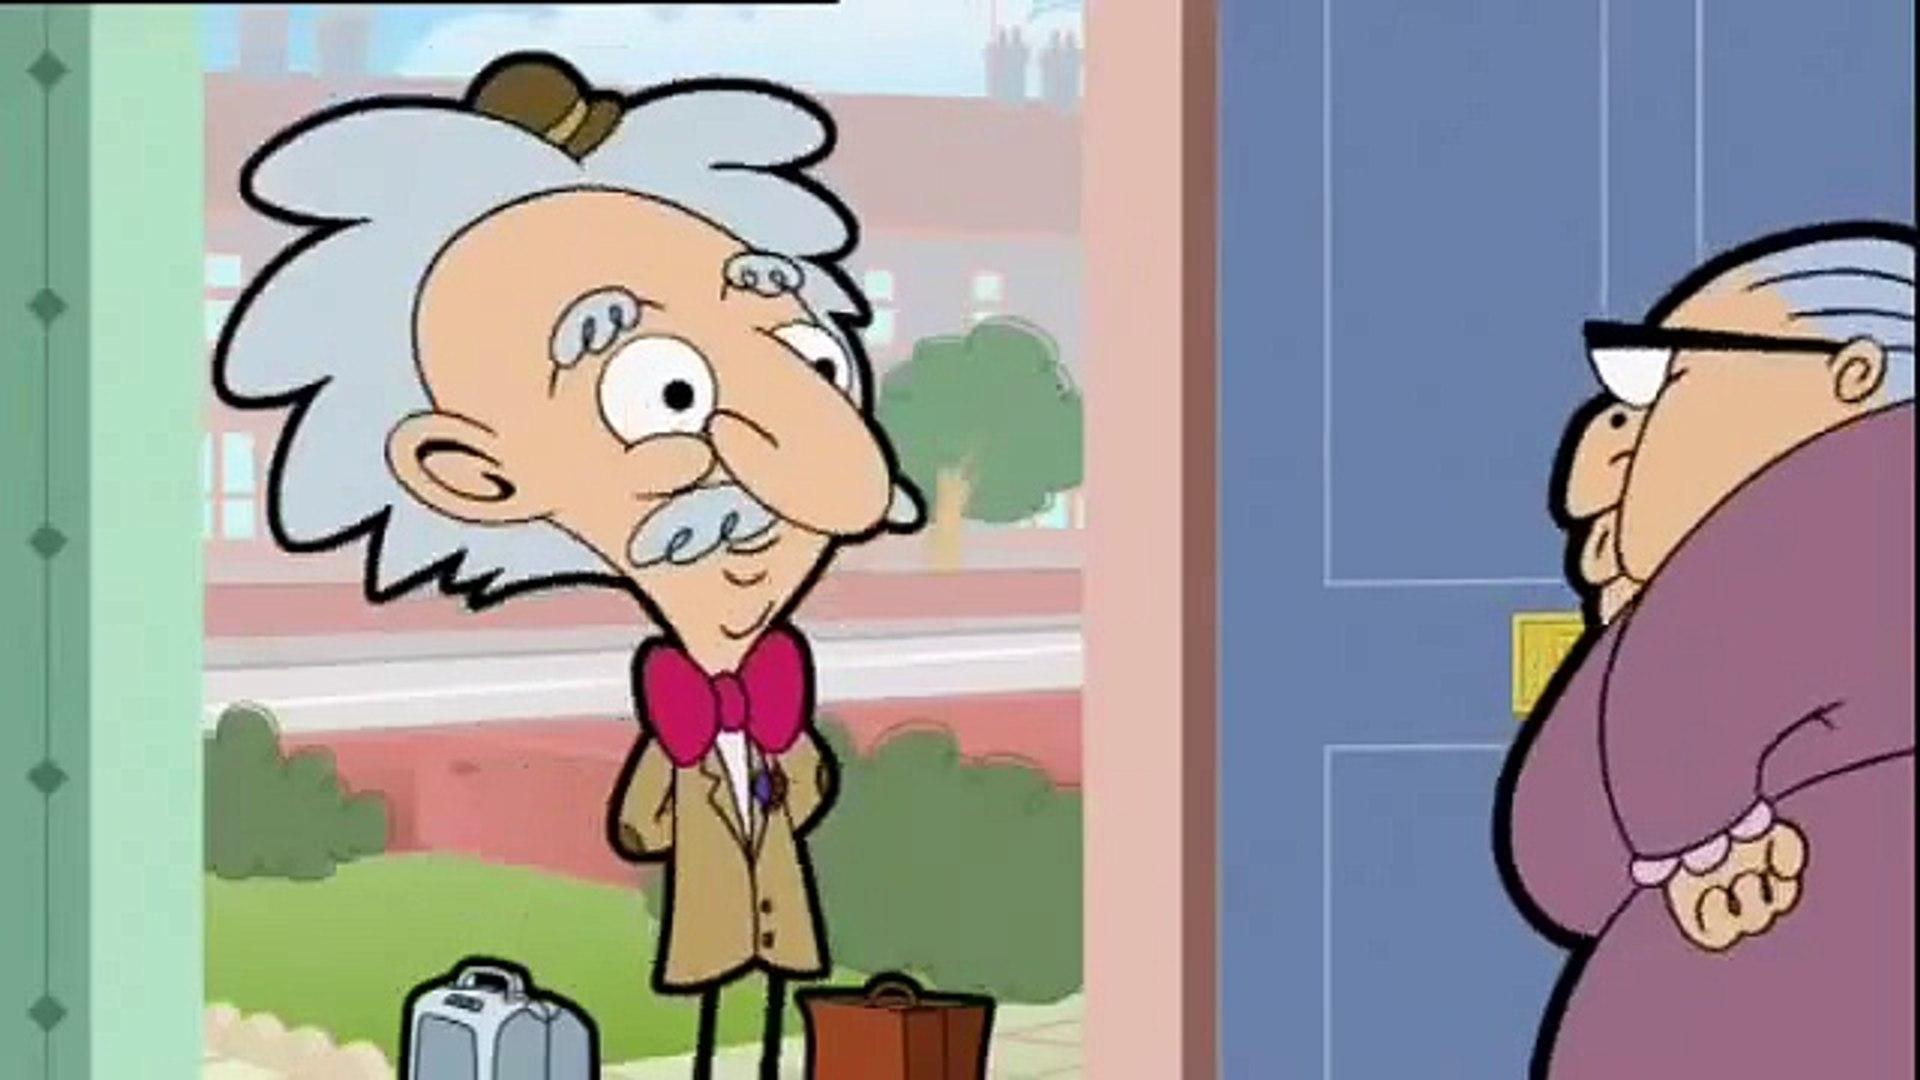 Mr Bean - Inventor - Animation Cartoon For Kids